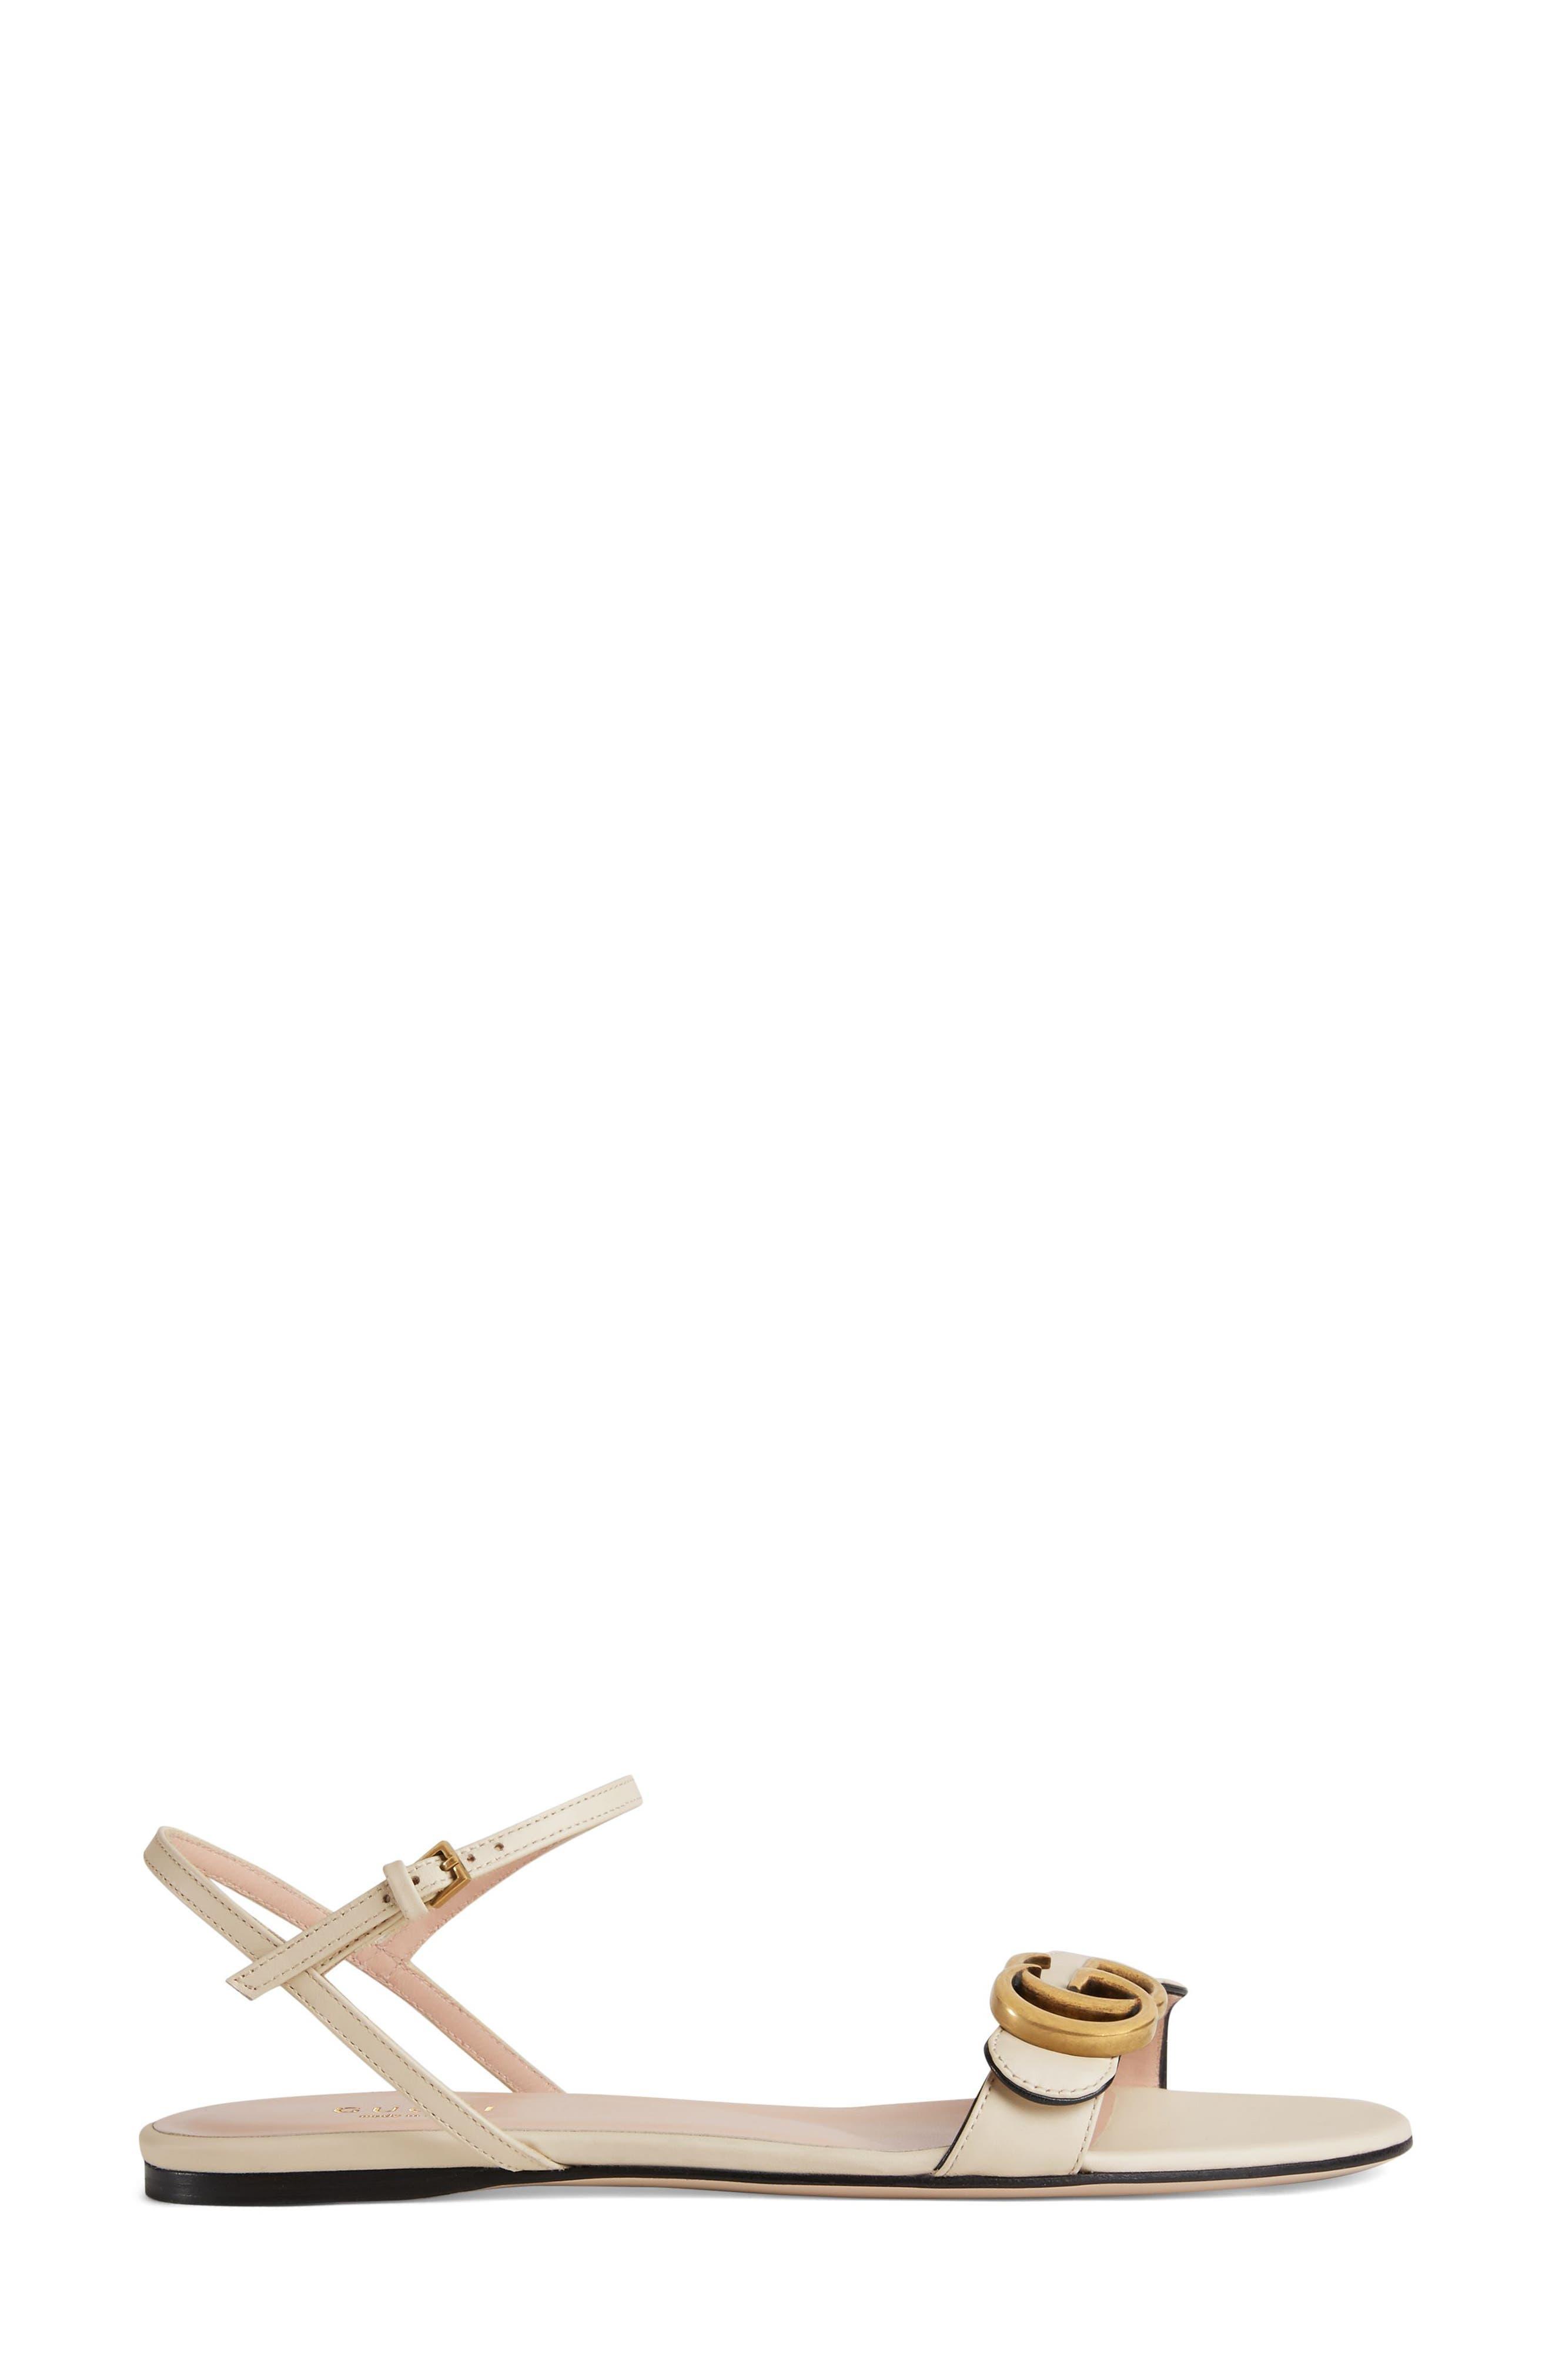 GUCCI, Marmont Quarter Strap Flat Sandal, Alternate thumbnail 2, color, MYSTIC WHITE